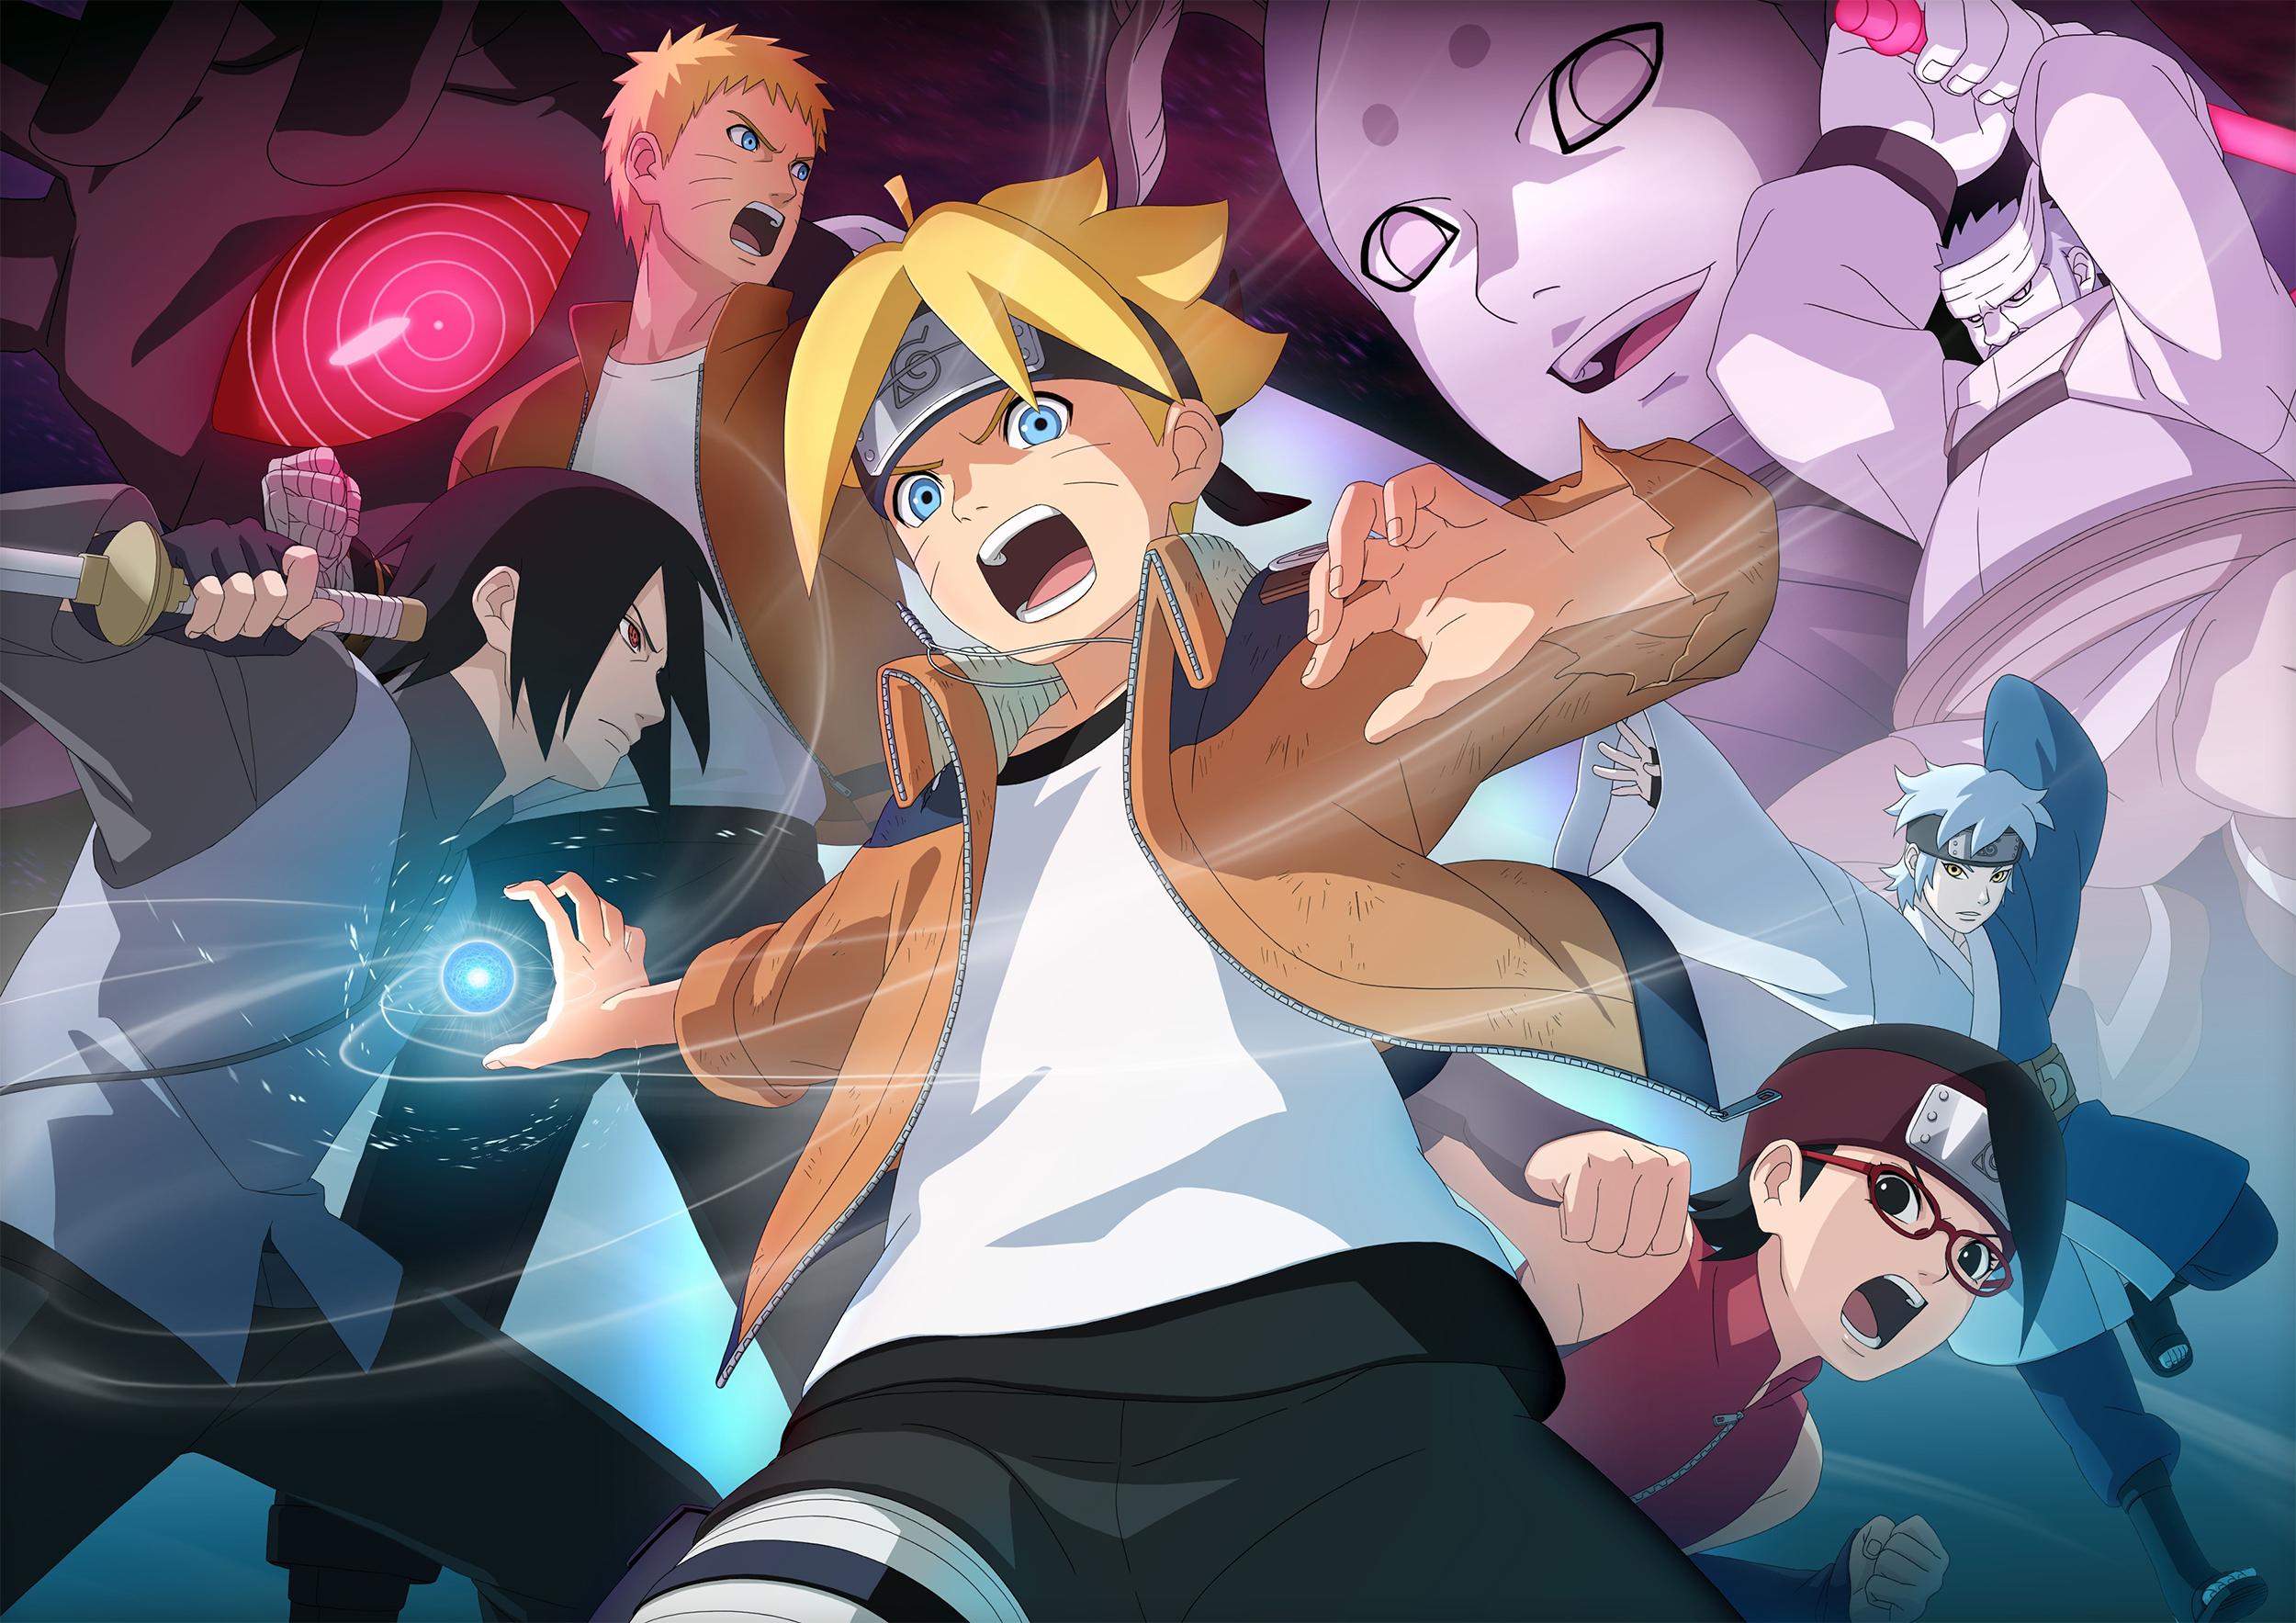 Análisis de Naruto Shippuden Ultimate Ninja Storm 4 - Road to Boruto